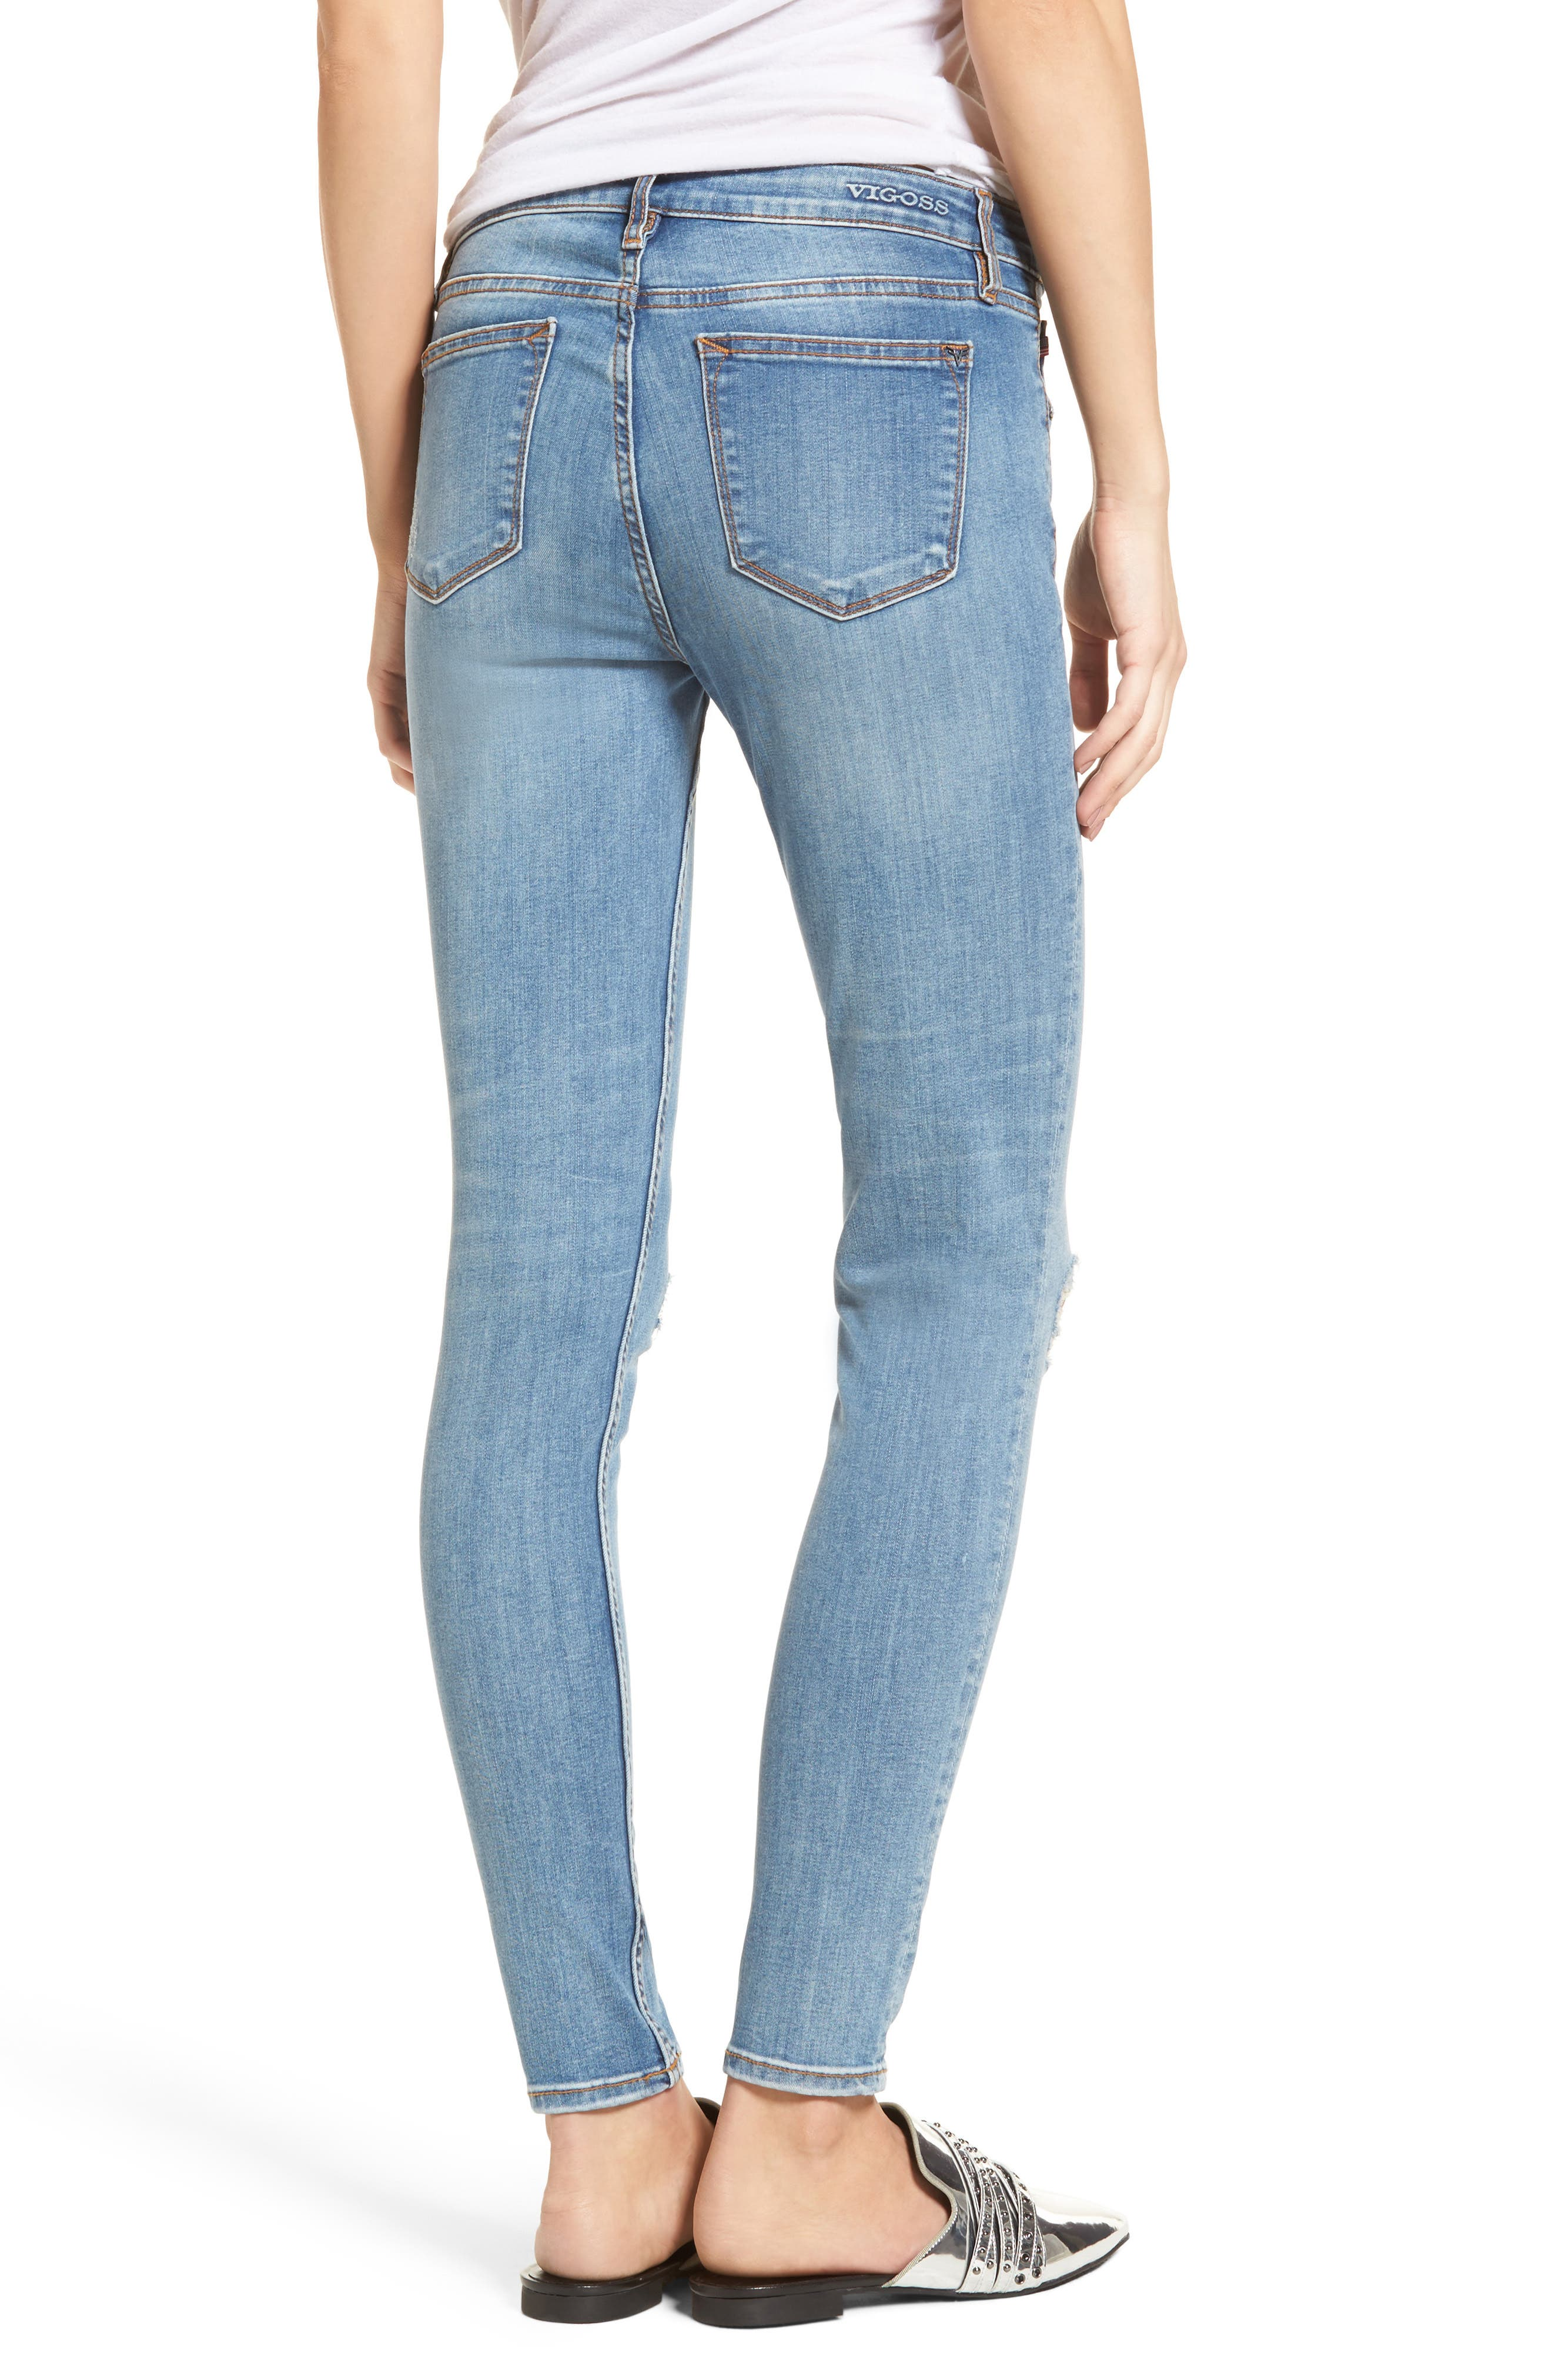 Edie Distressed Skinny Jeans,                             Alternate thumbnail 2, color,                             461